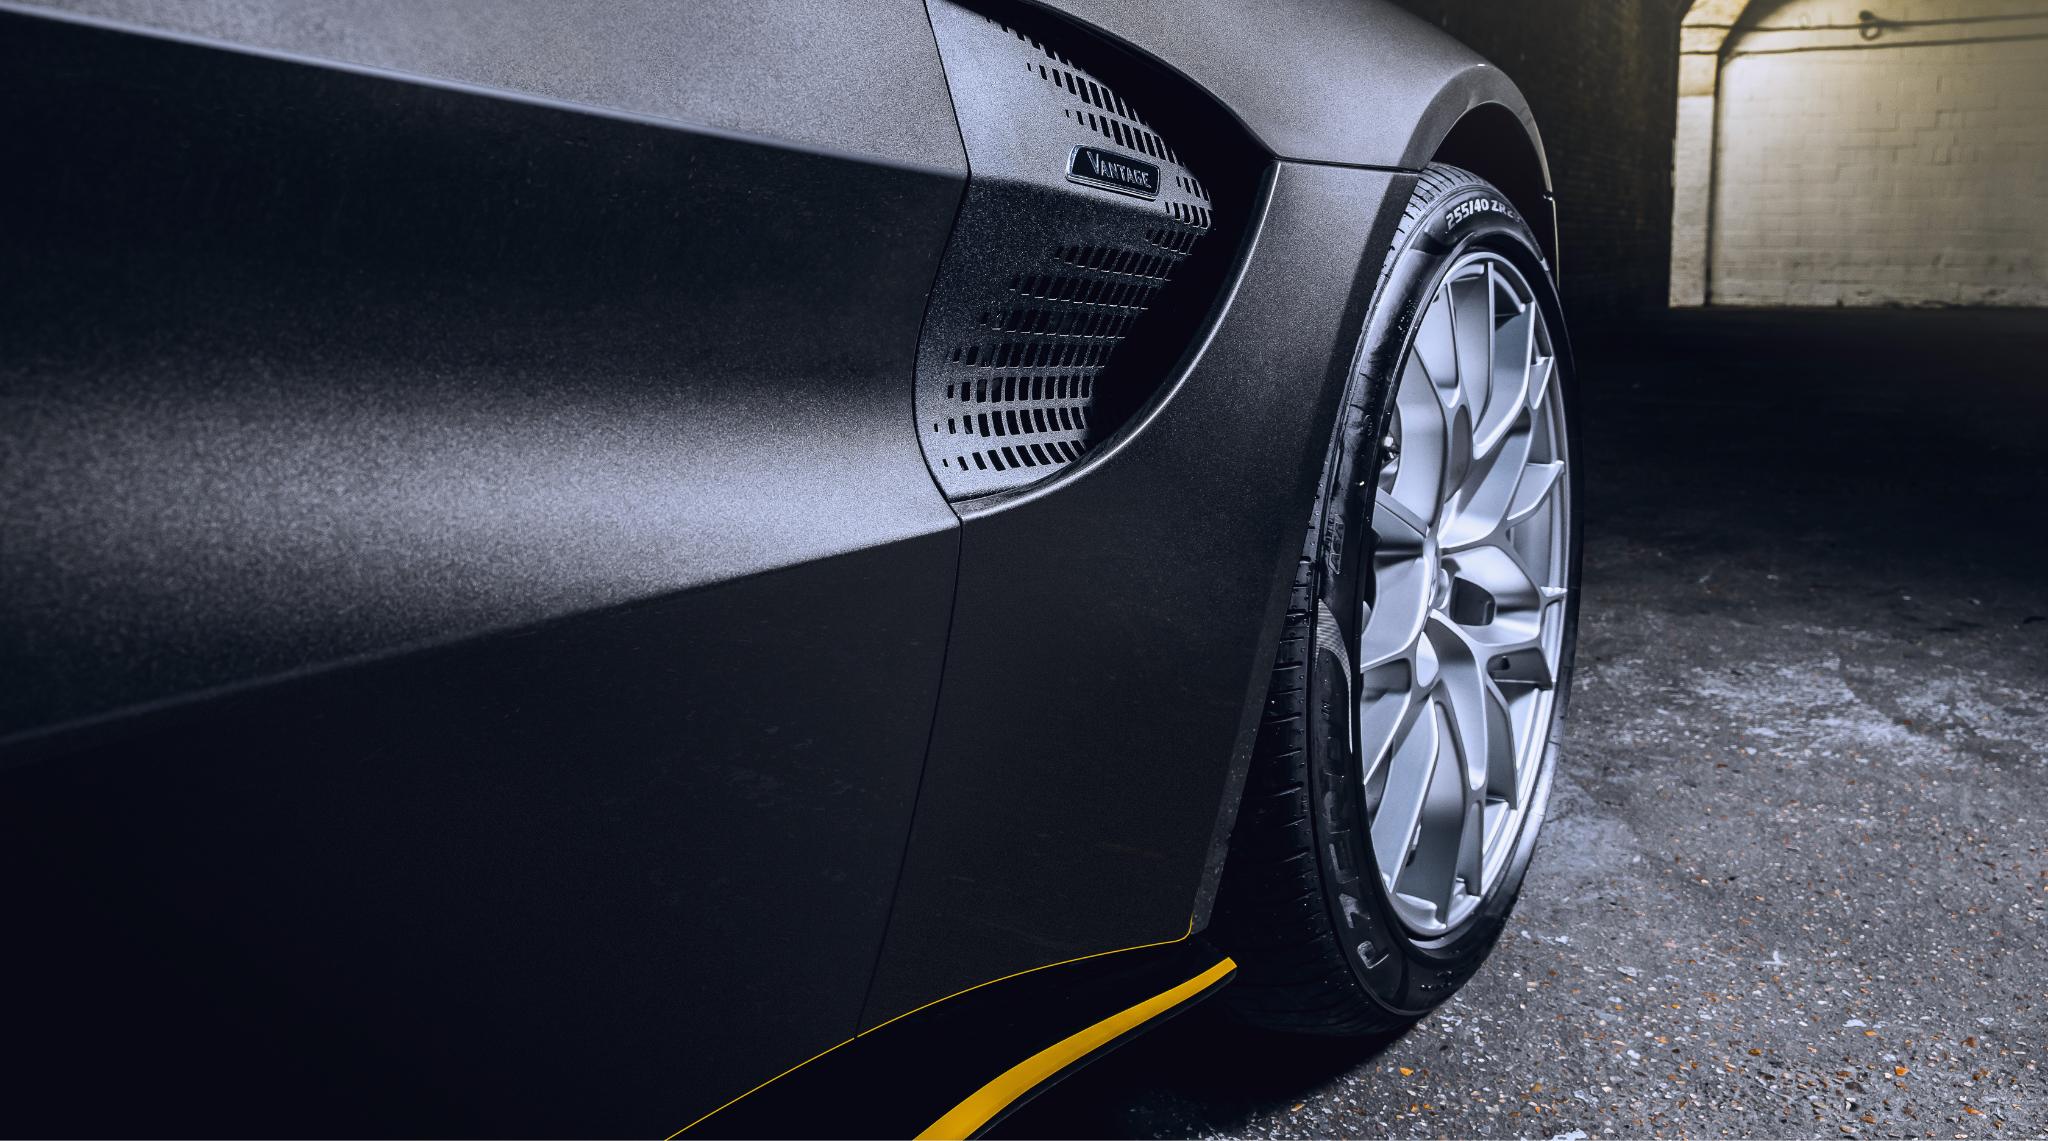 Aston Martin Vantage 007 Edition Side